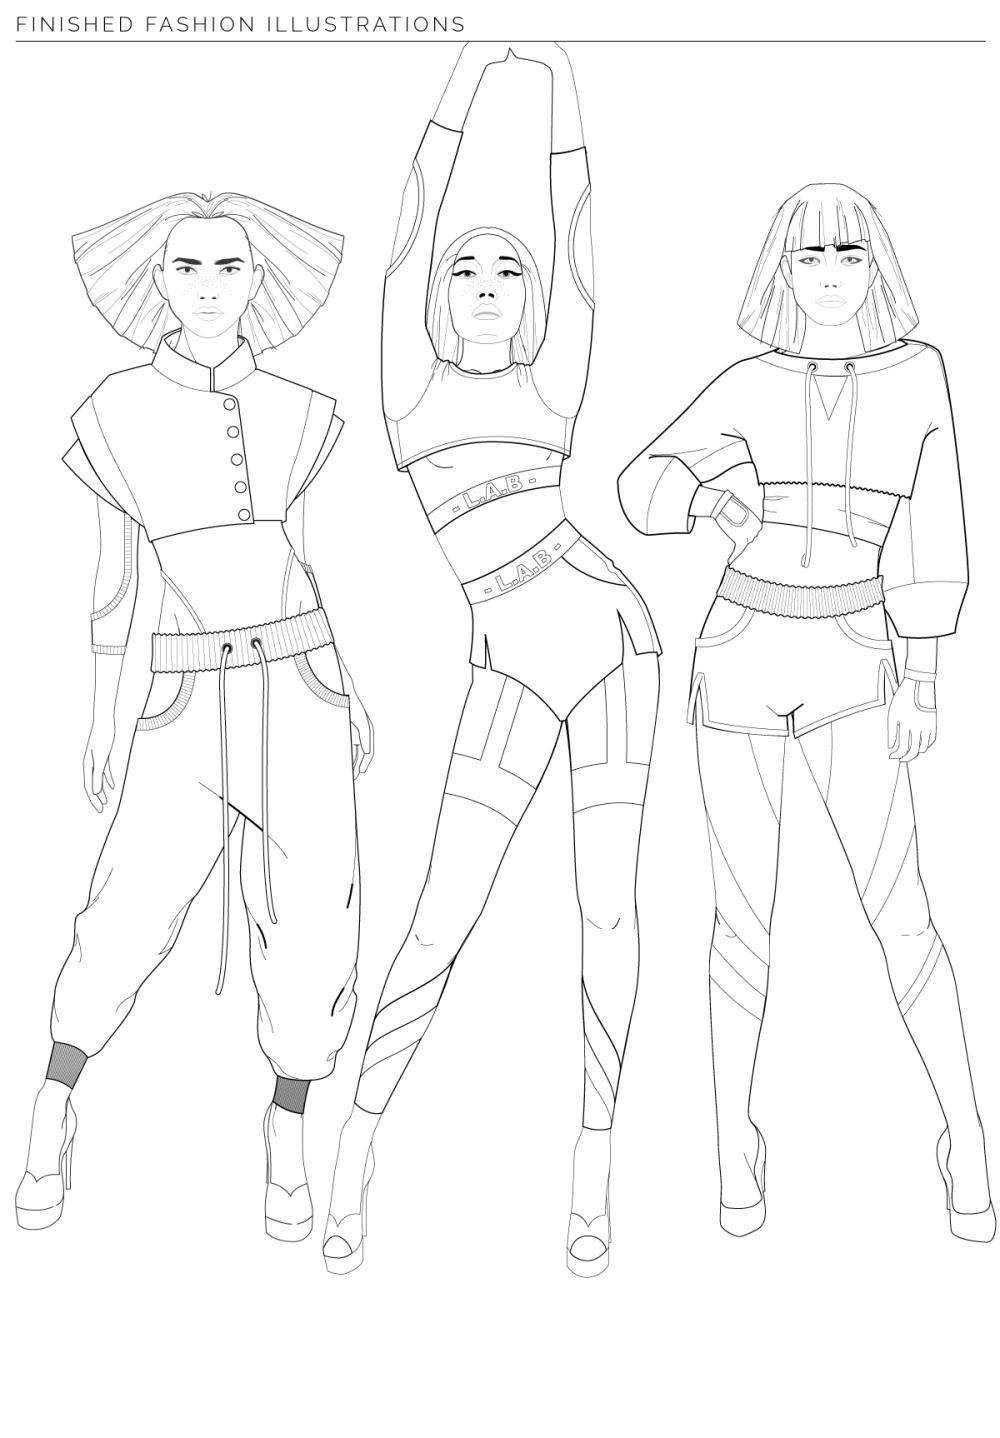 digital fashion illustration in adobe illustrator model templates pack